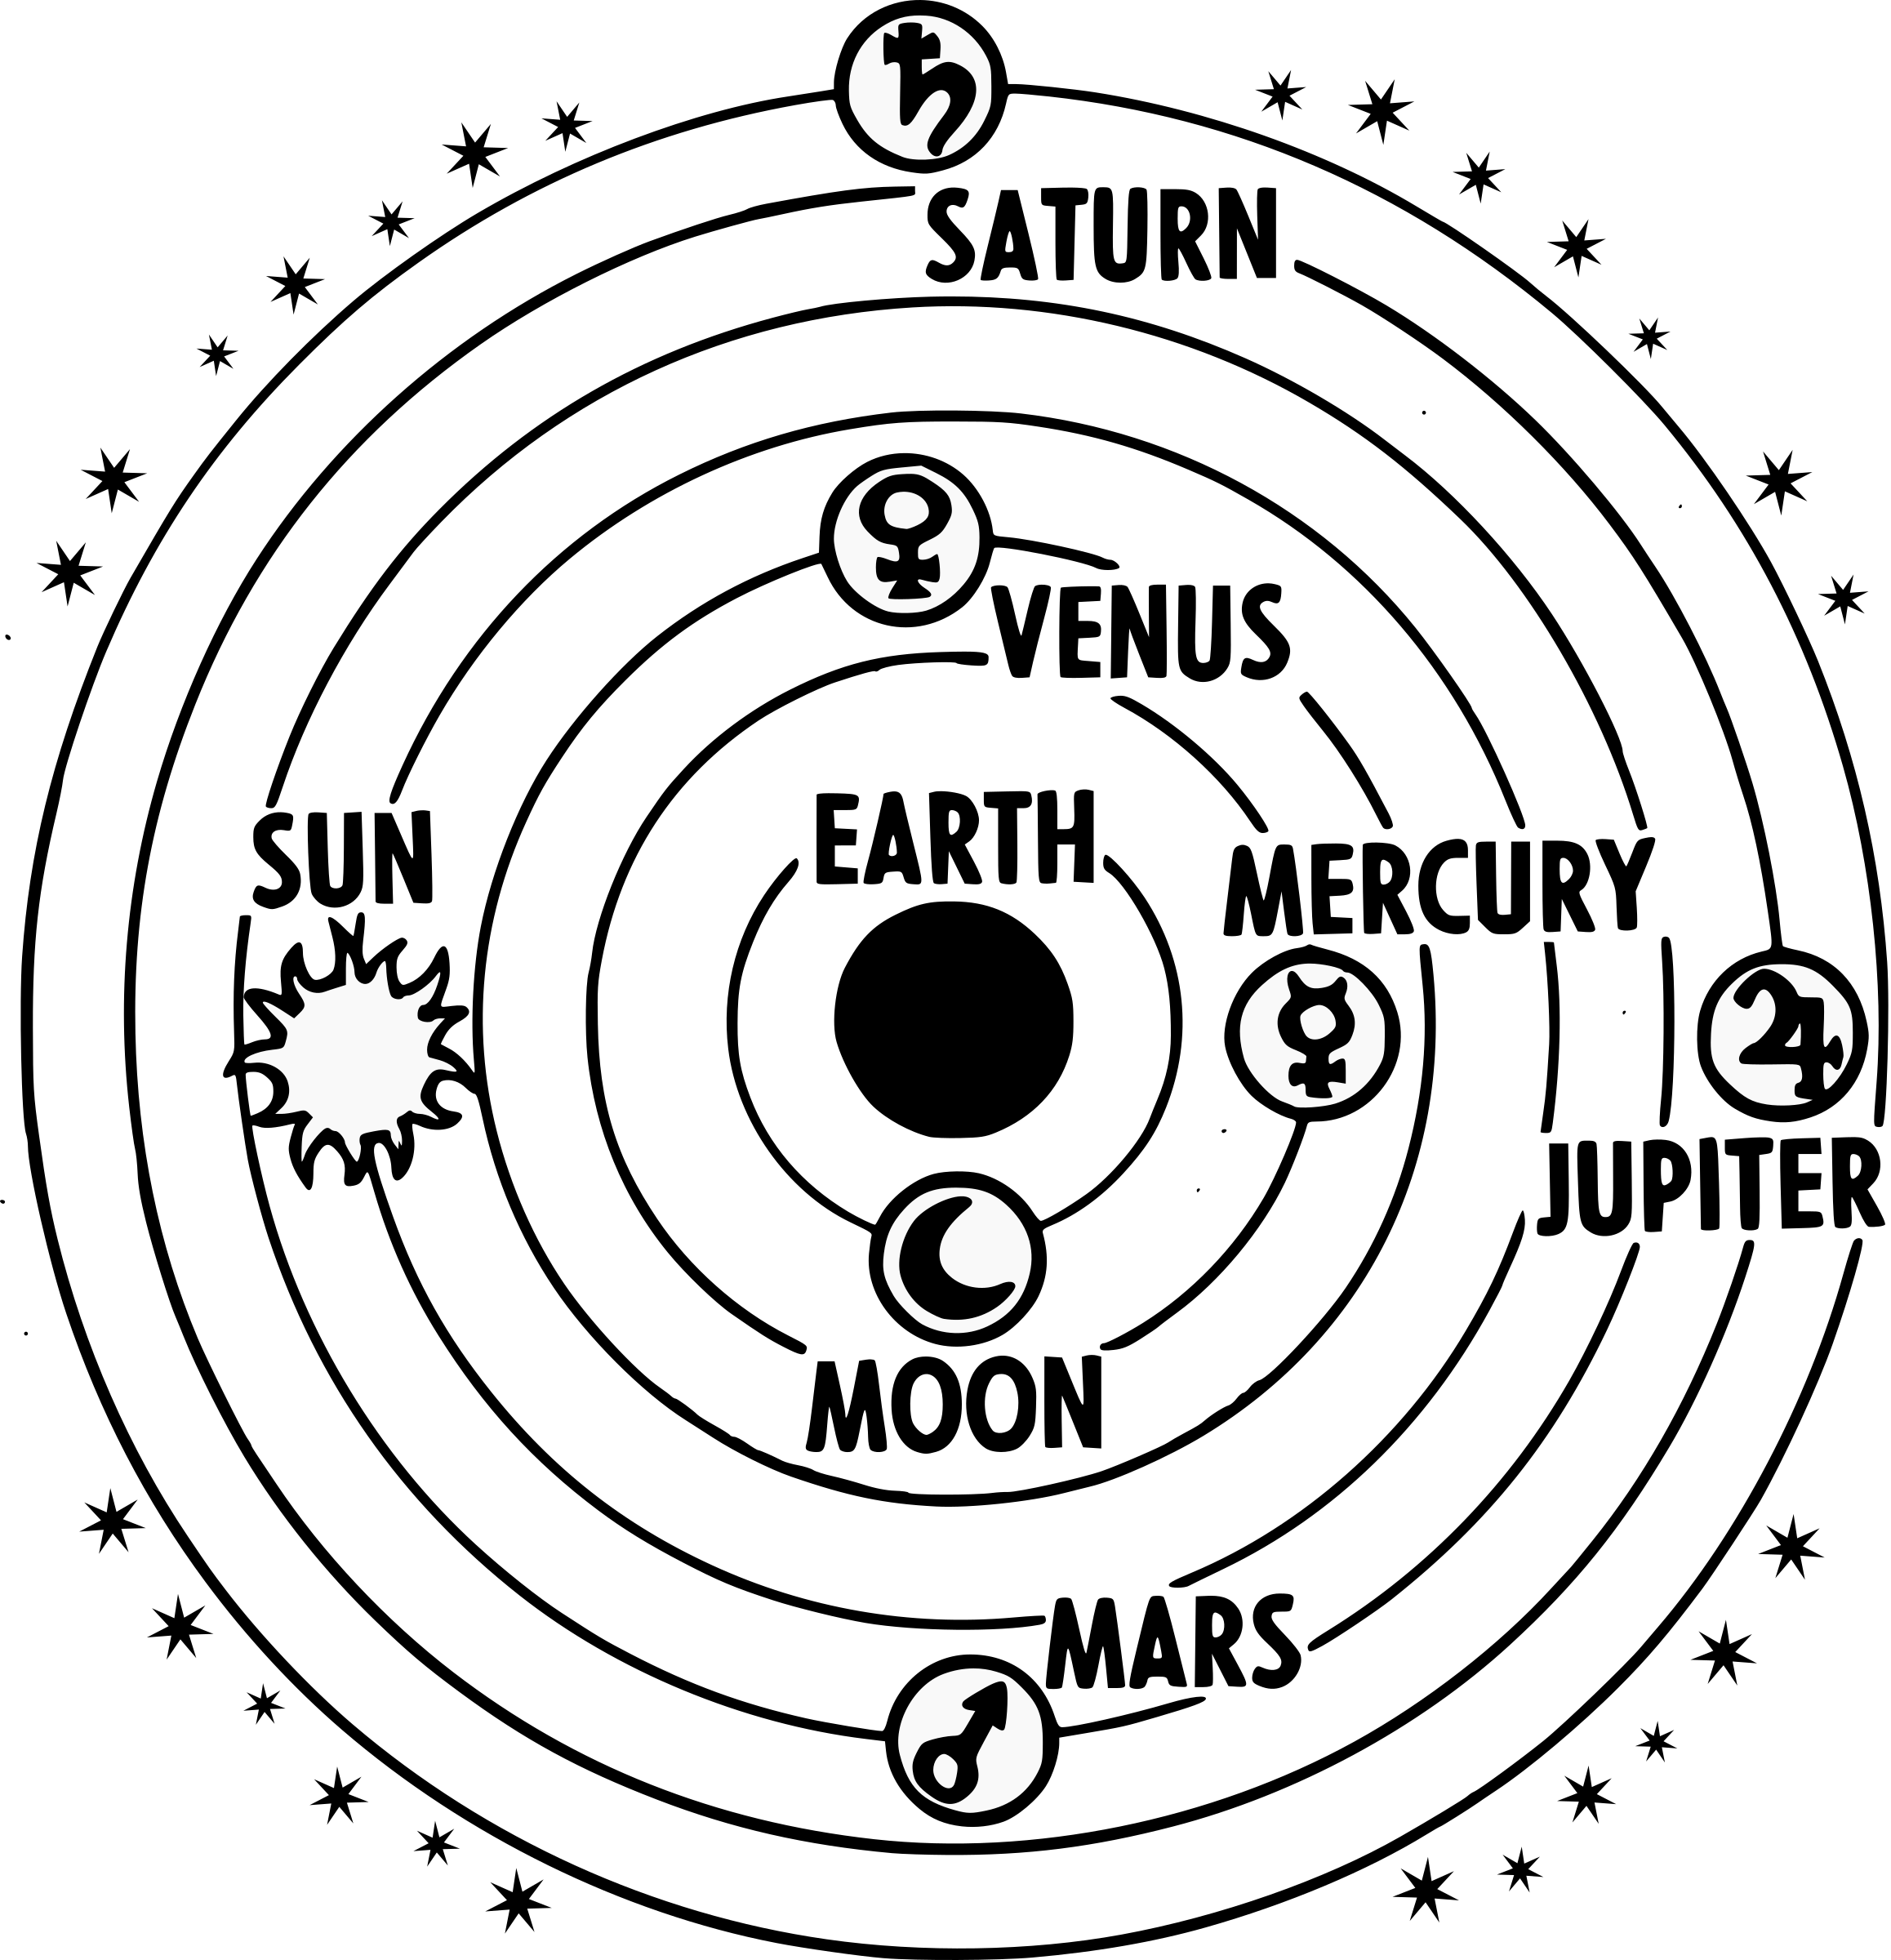 Solar system geocentric big. Handcuffs clipart easy drawing